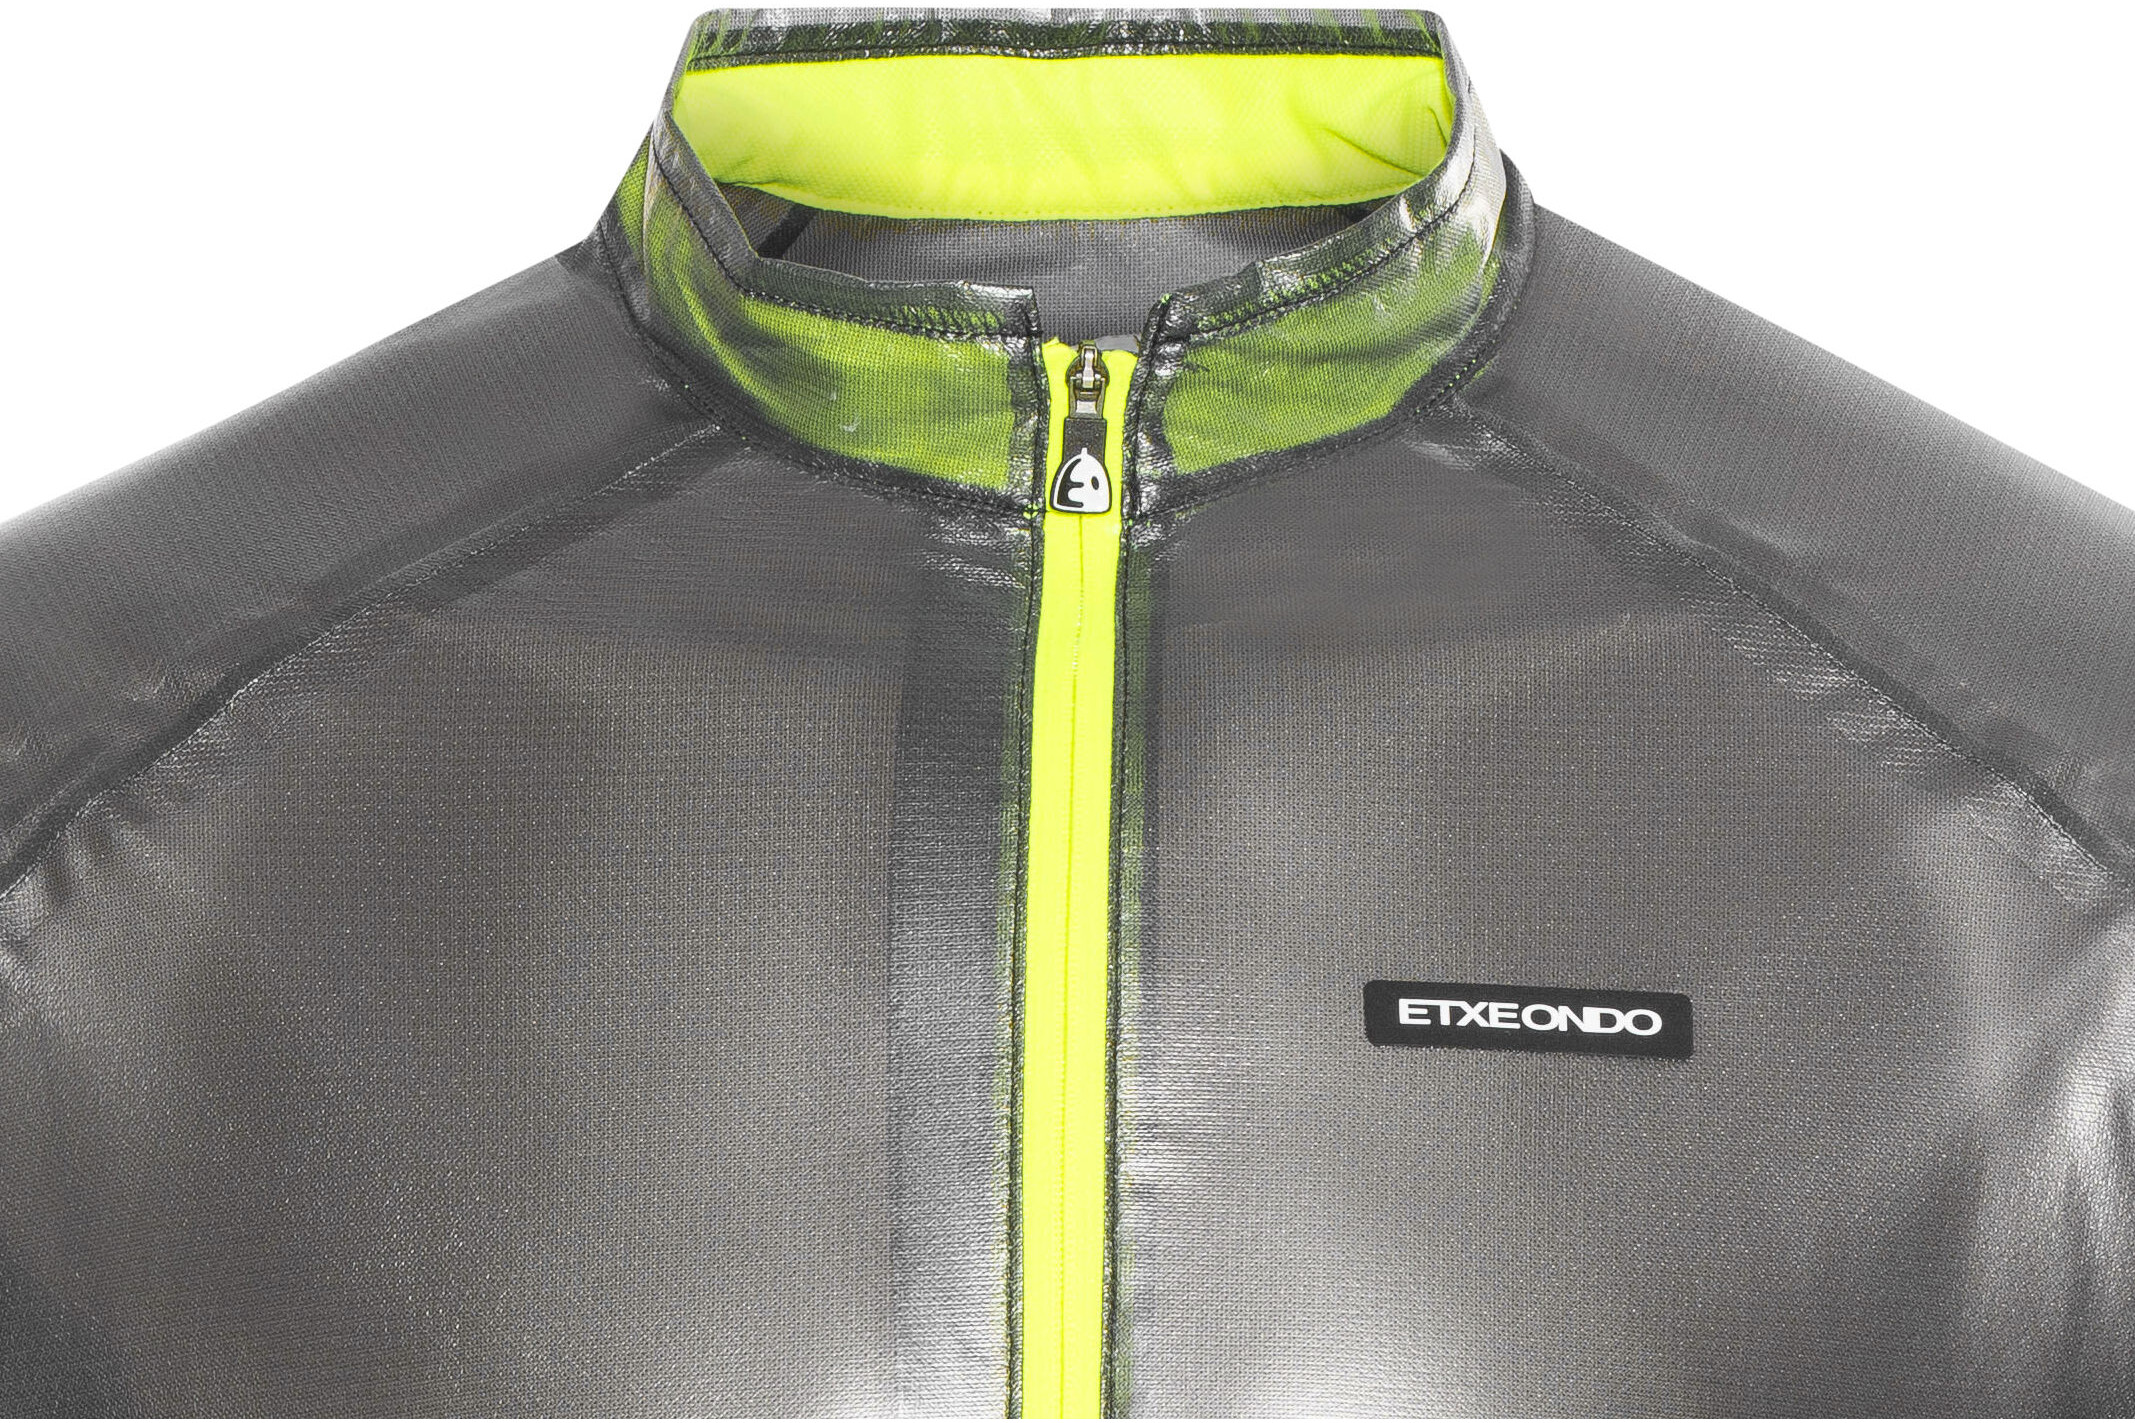 Etxeondo Busti Rain Jacket Men Black Fluor At Bikester Co Uk